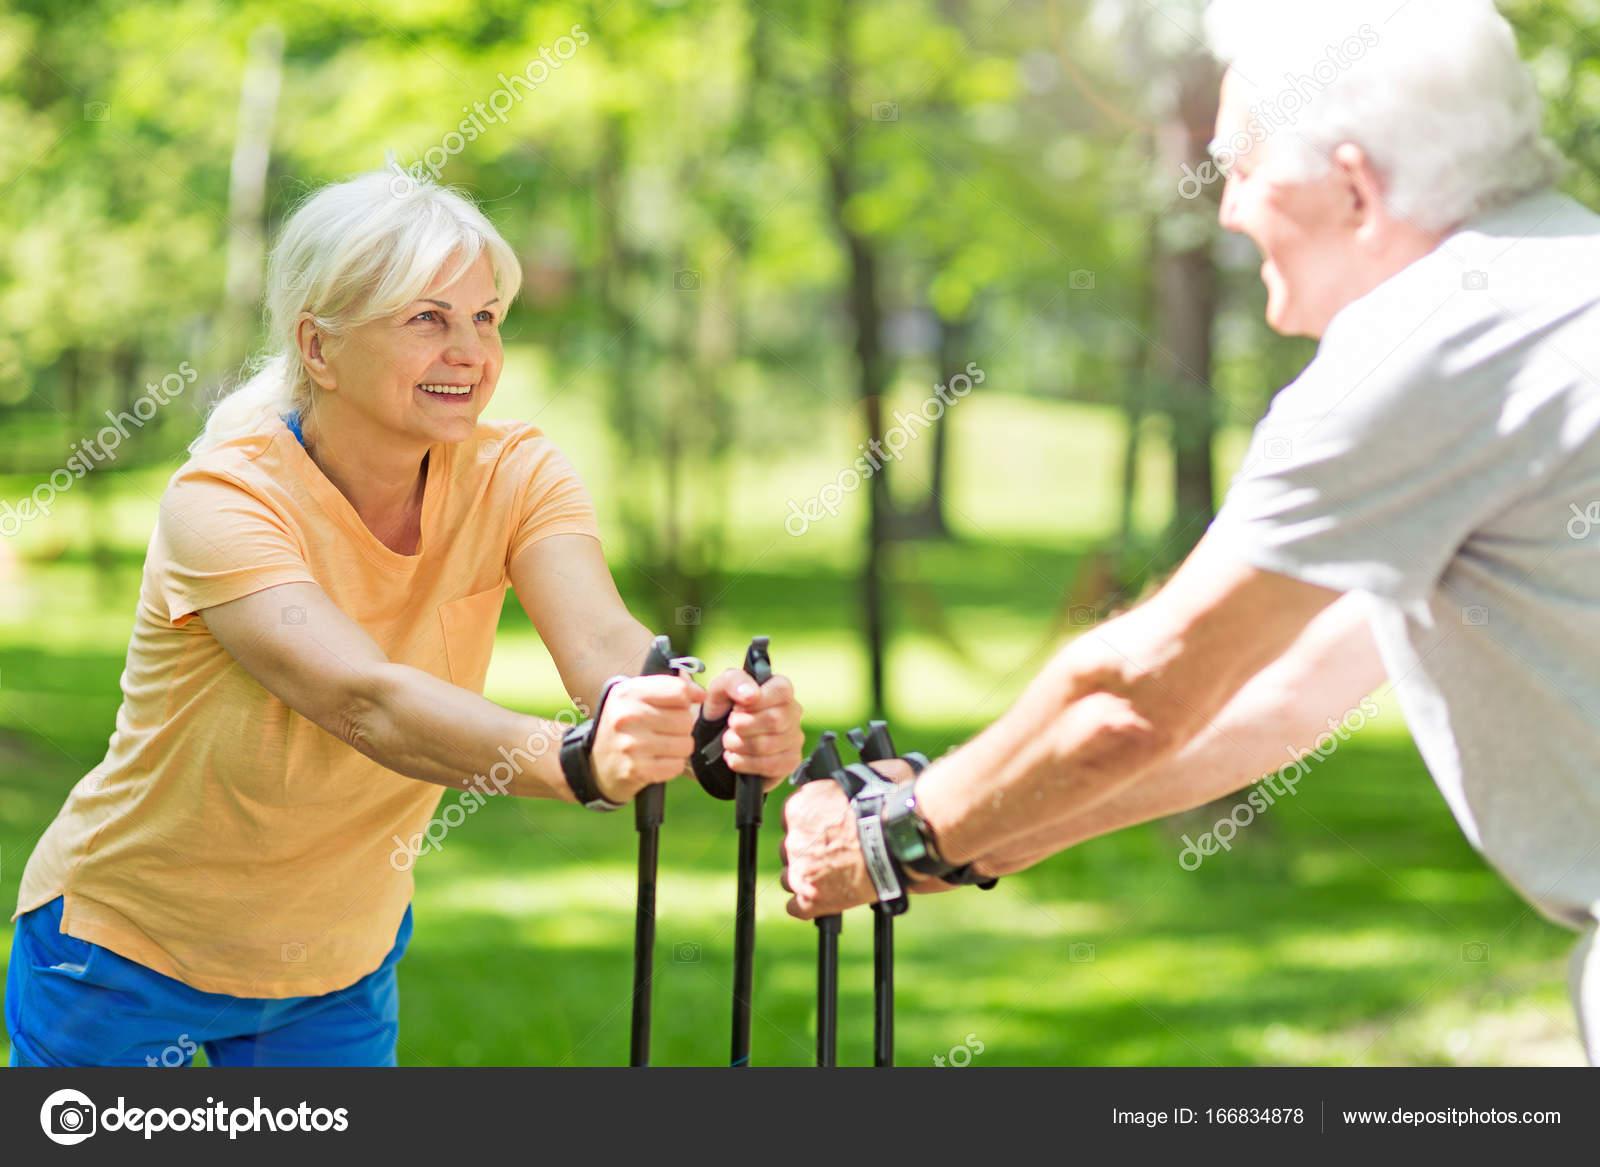 Looking For Older Wealthy Seniors In Philadelphia